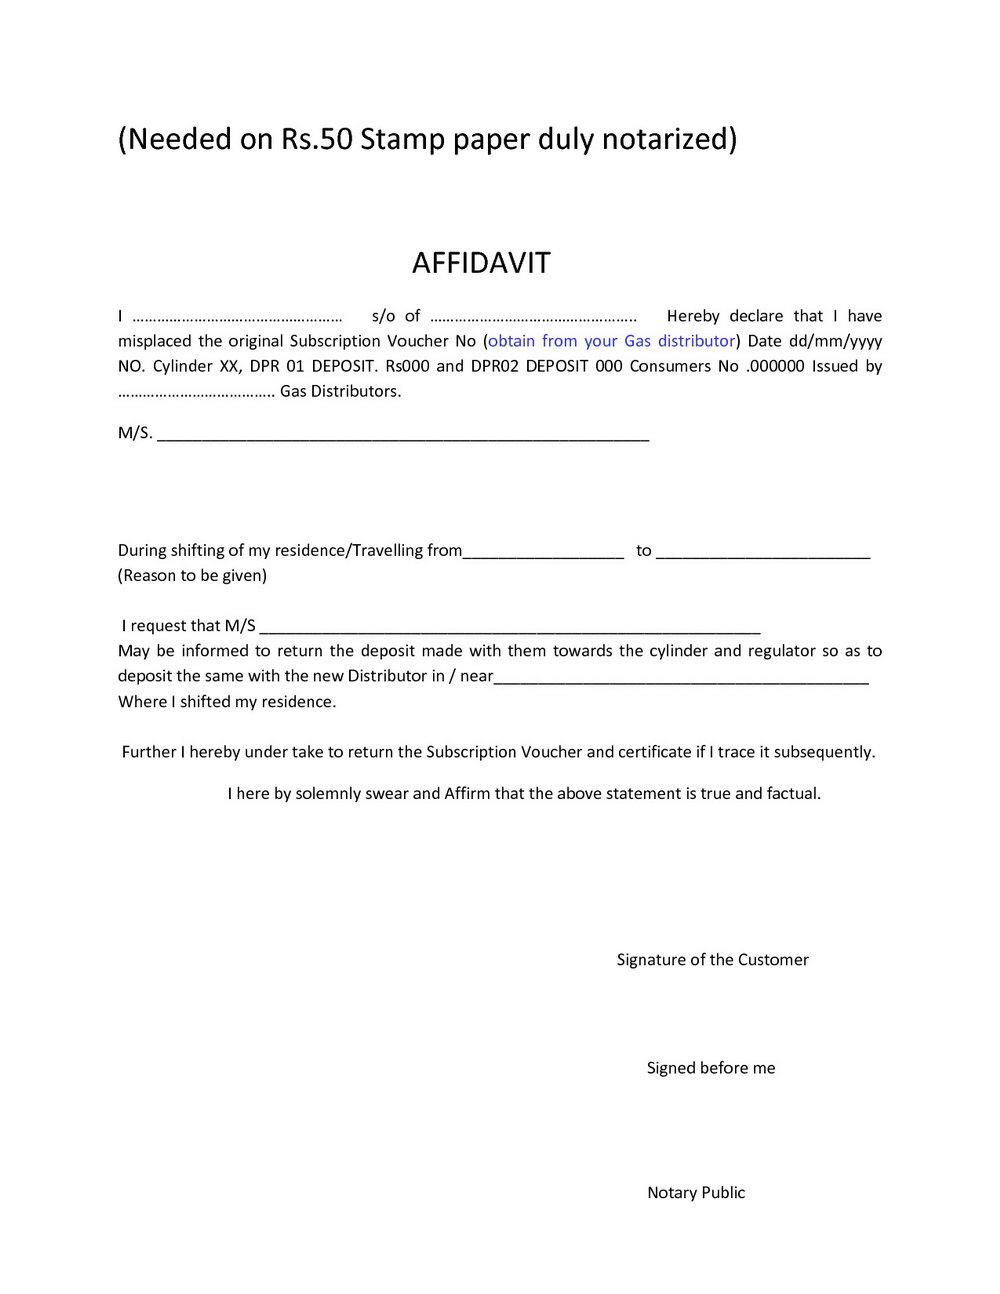 Affidavit Of Death And Heirship Form Oklahoma